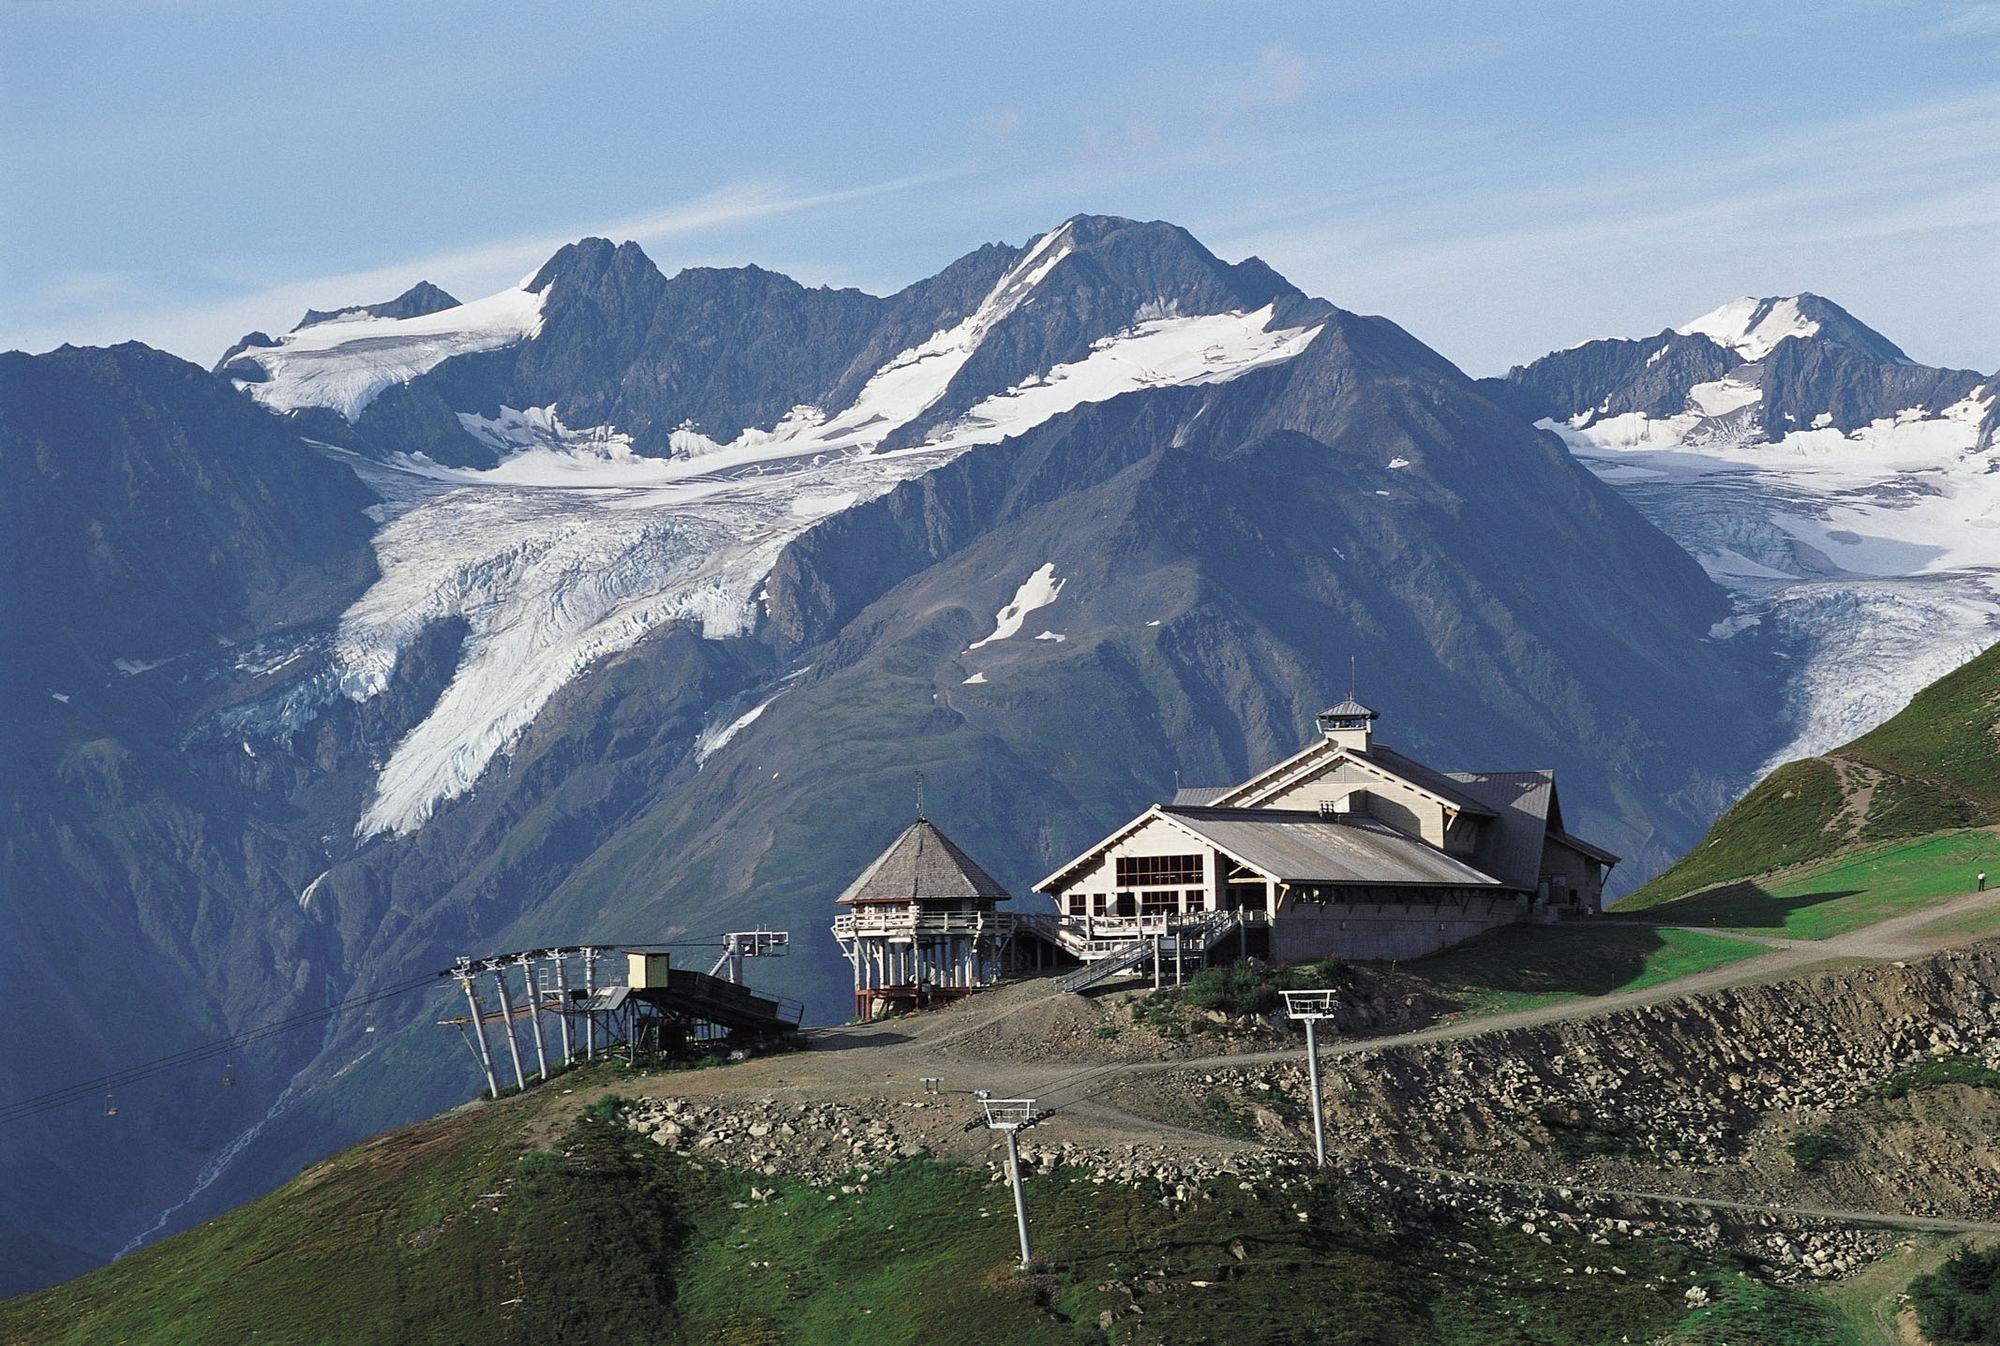 Discount Coupon For The Hotel Alyeska In Girdwood Alaska